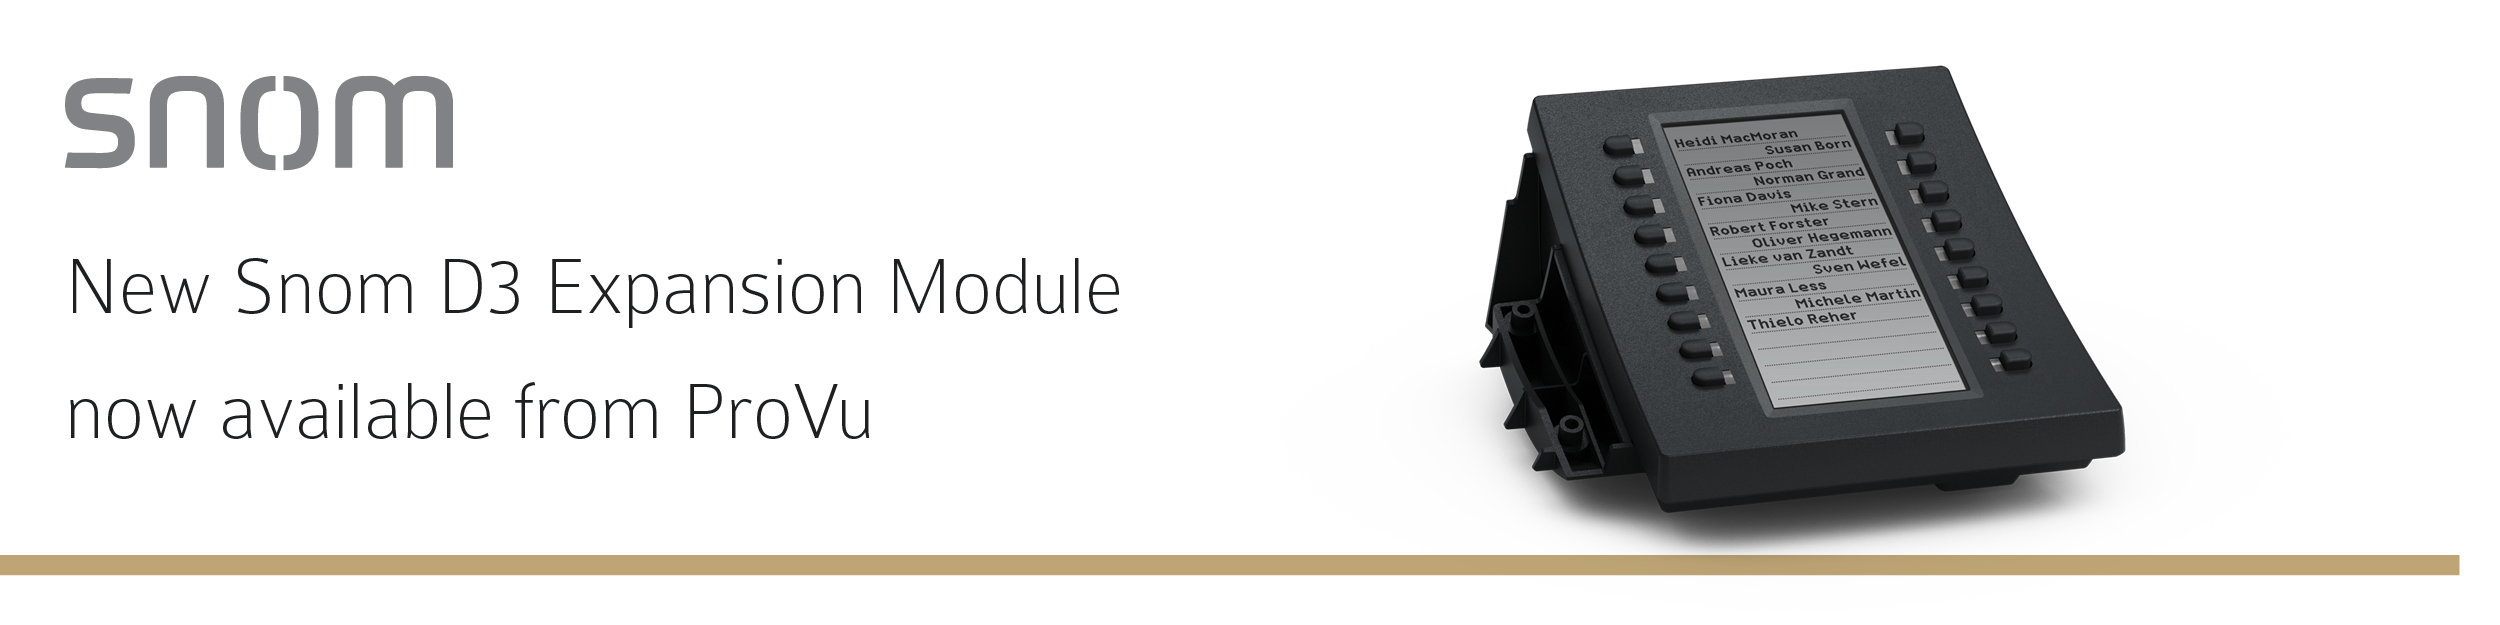 Snom D3 Expansion Module now available form ProVu